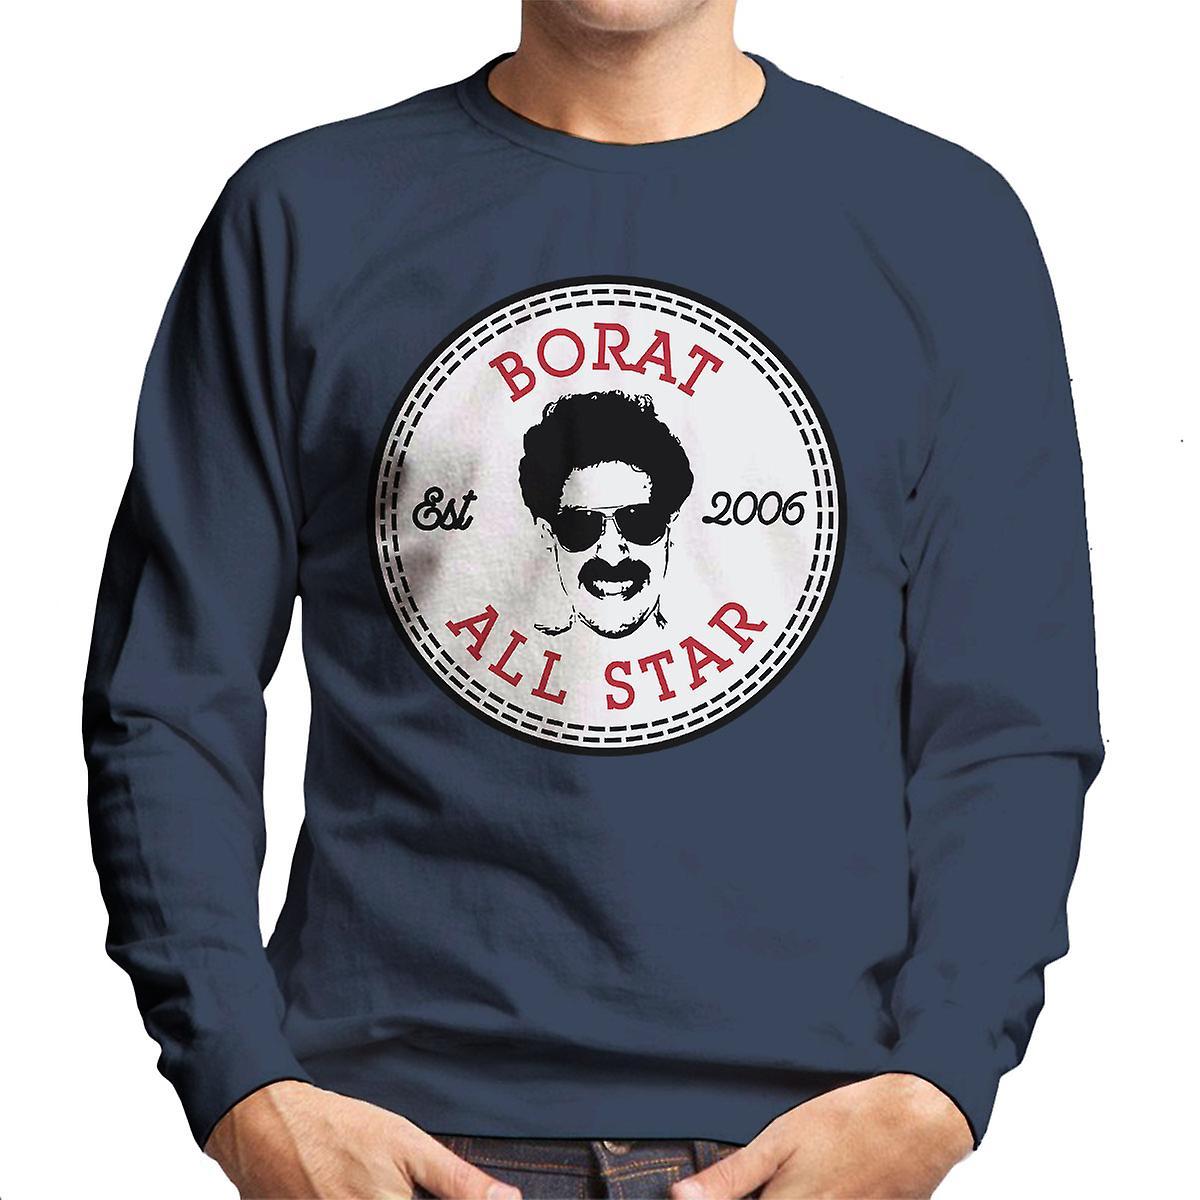 converse borat all star herren sweatshirt fruugo. Black Bedroom Furniture Sets. Home Design Ideas